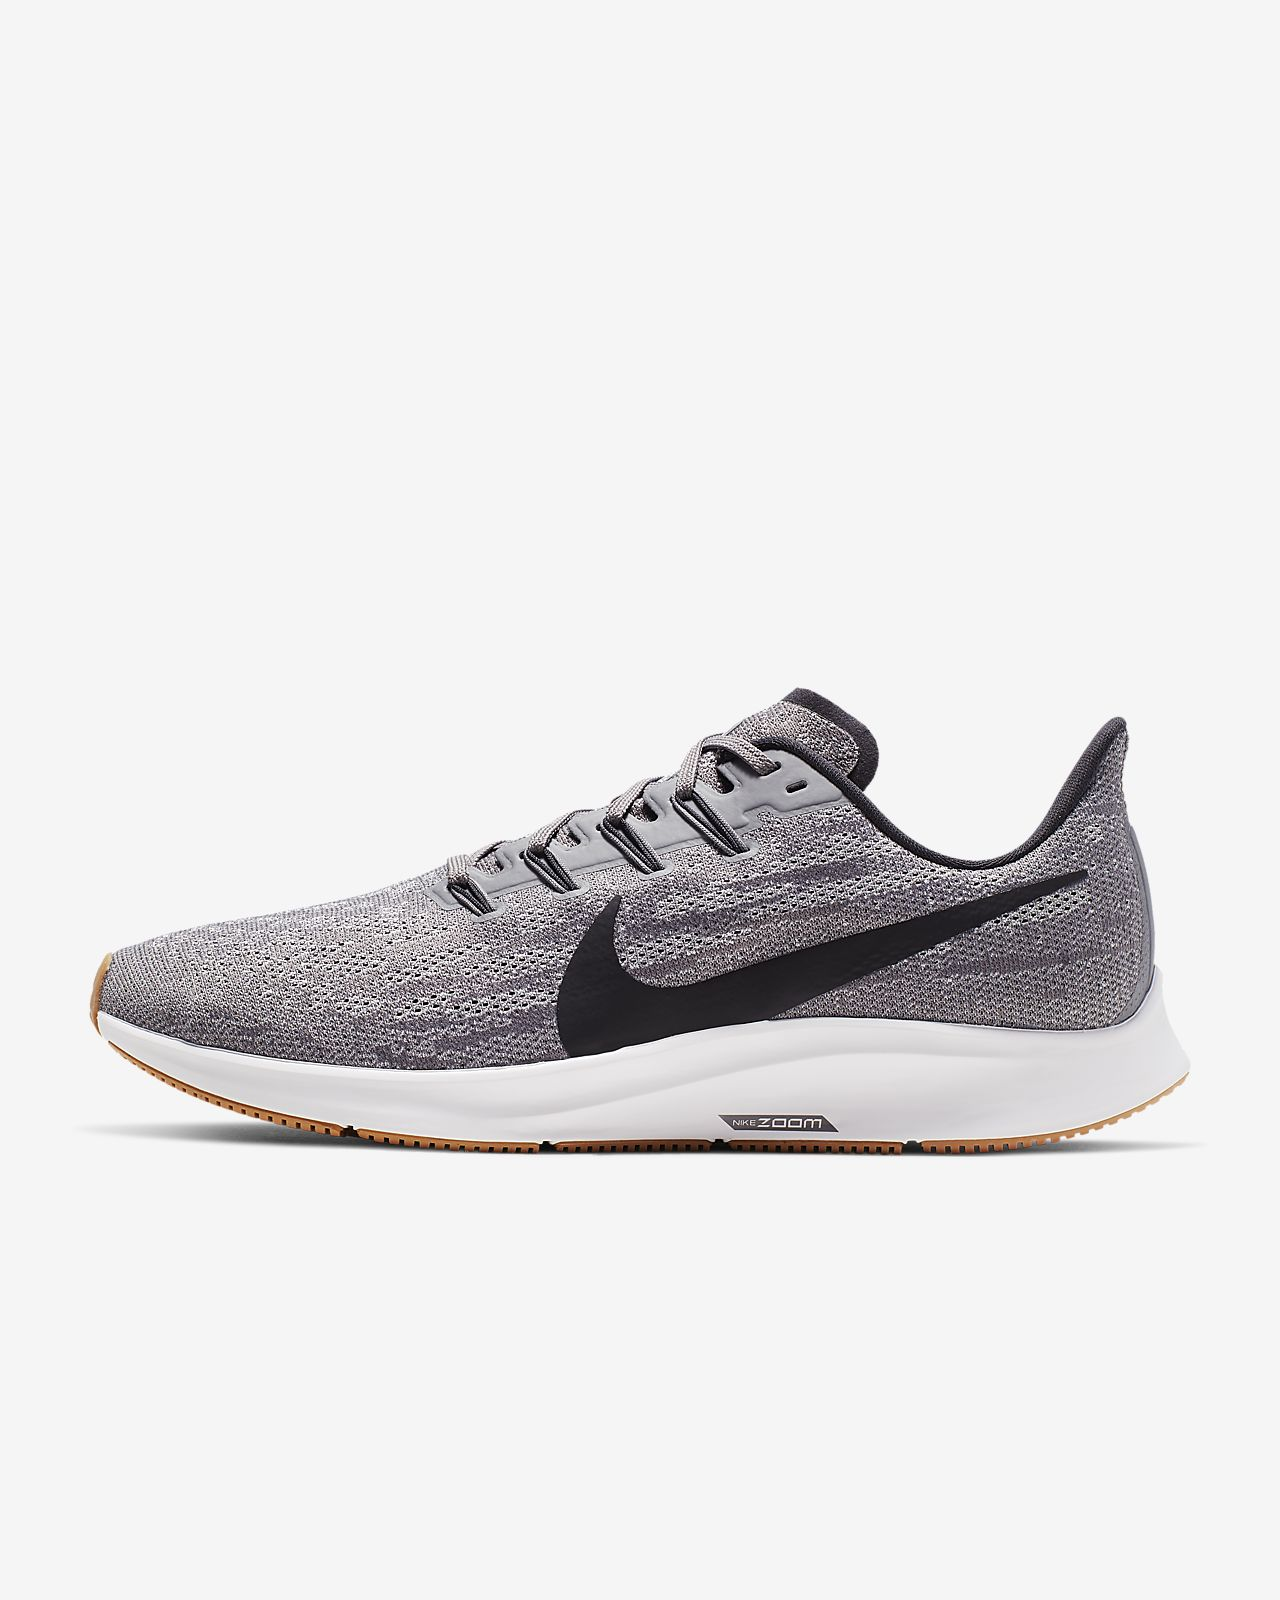 hot sale online f903b b0667 Nike Air Zoom Pegasus 36 Men's Running Shoe